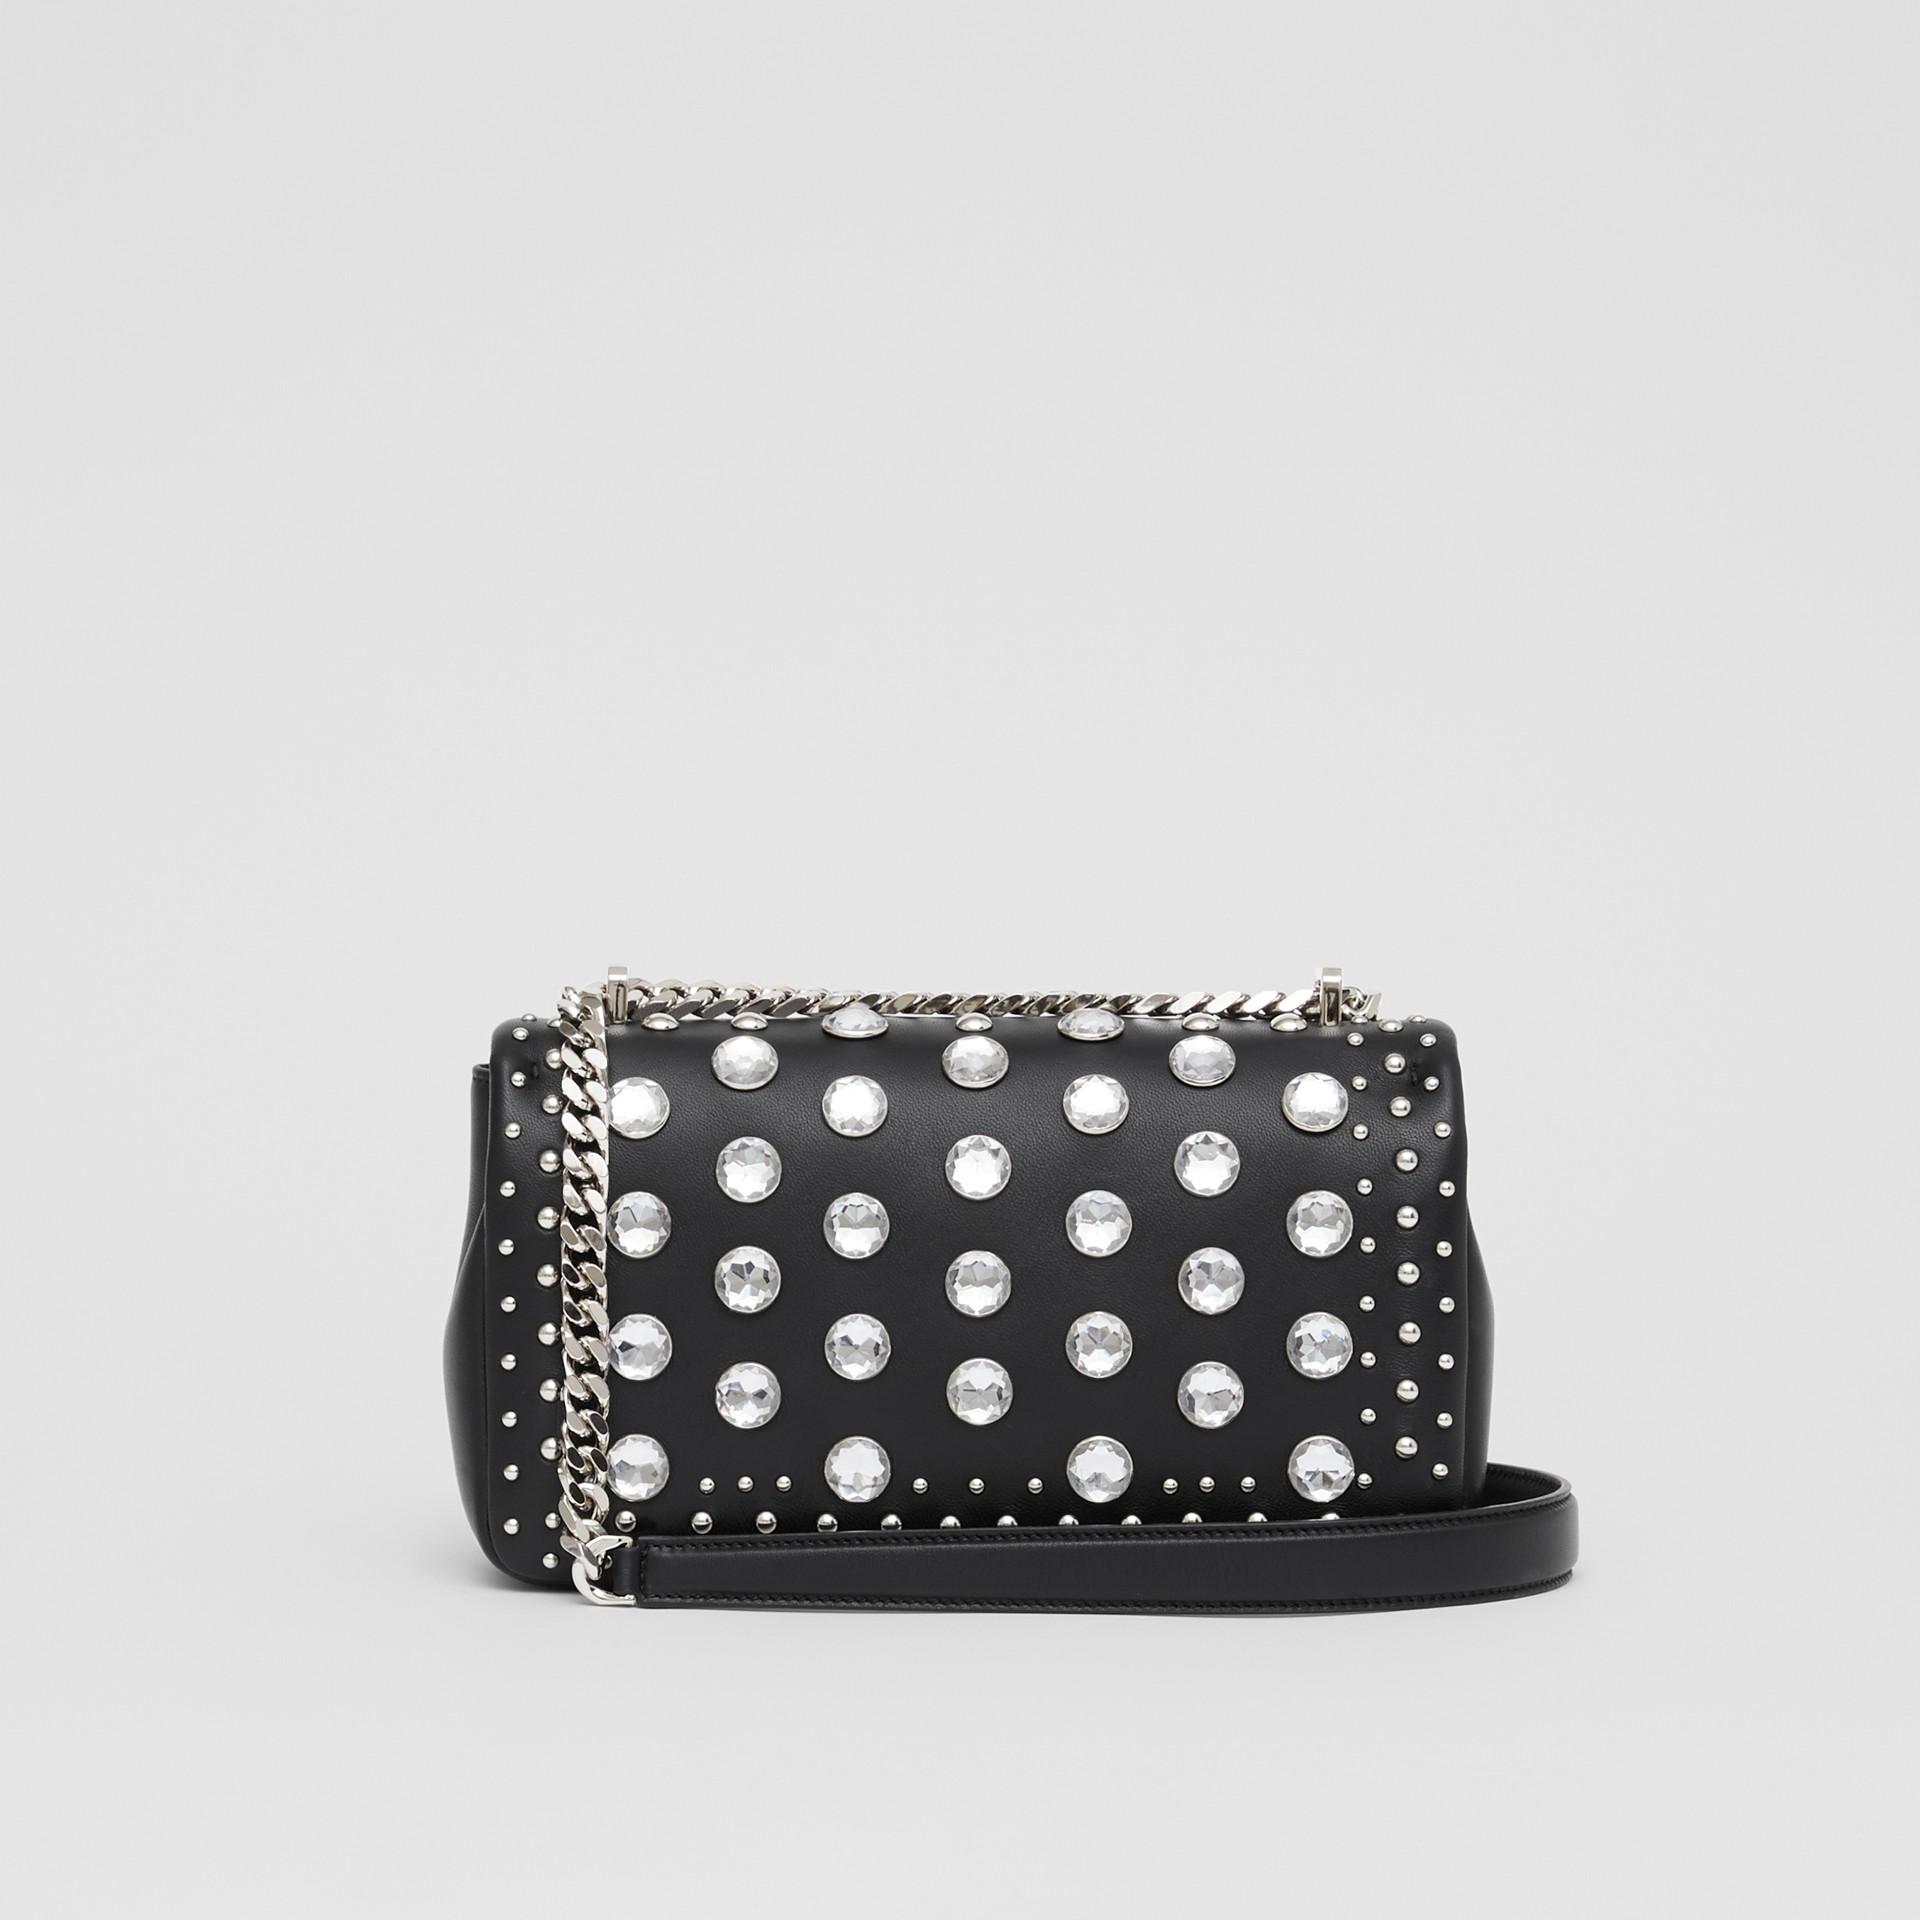 Small Embellished Lambskin Lola Bag in Black - Women | Burberry - gallery image 7